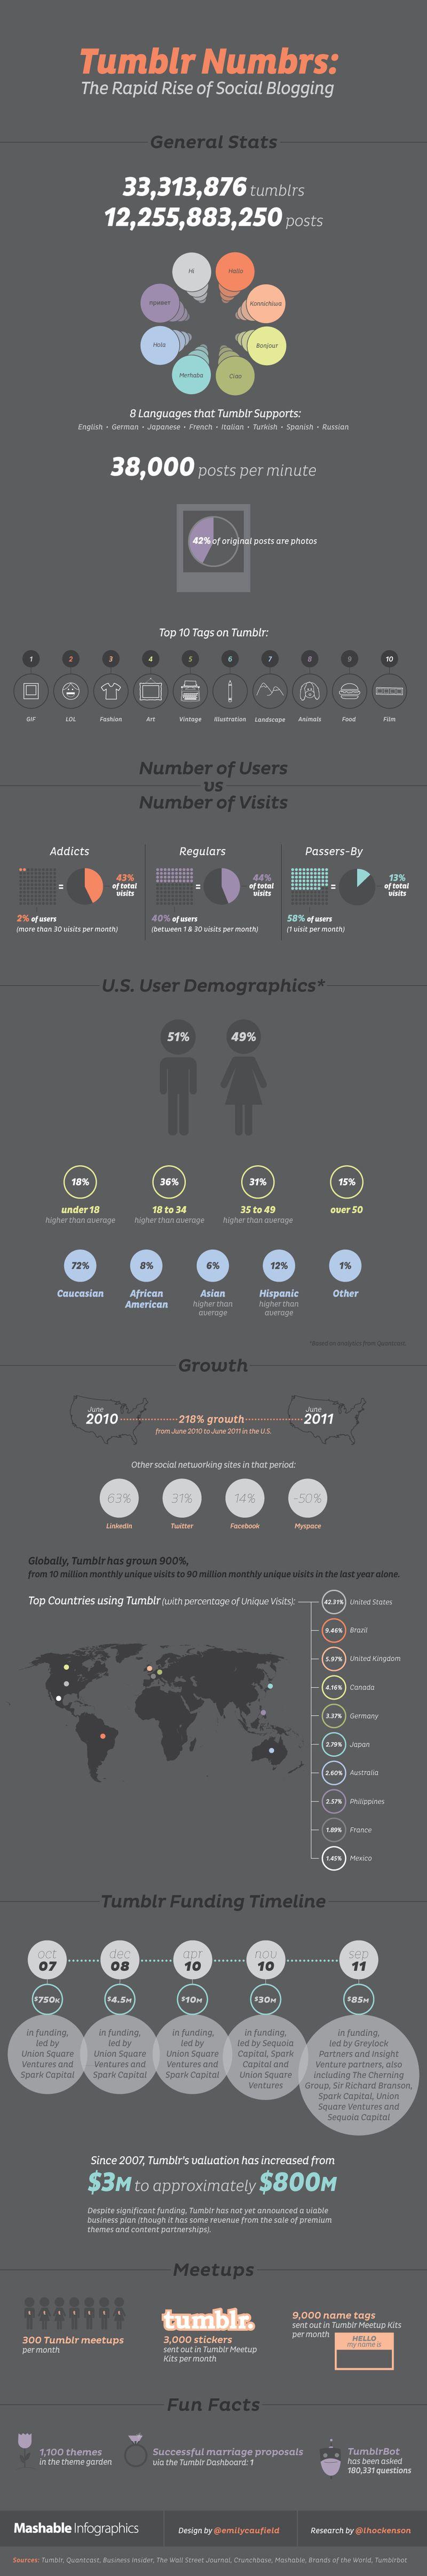 Tumblr growth infographic Mashable